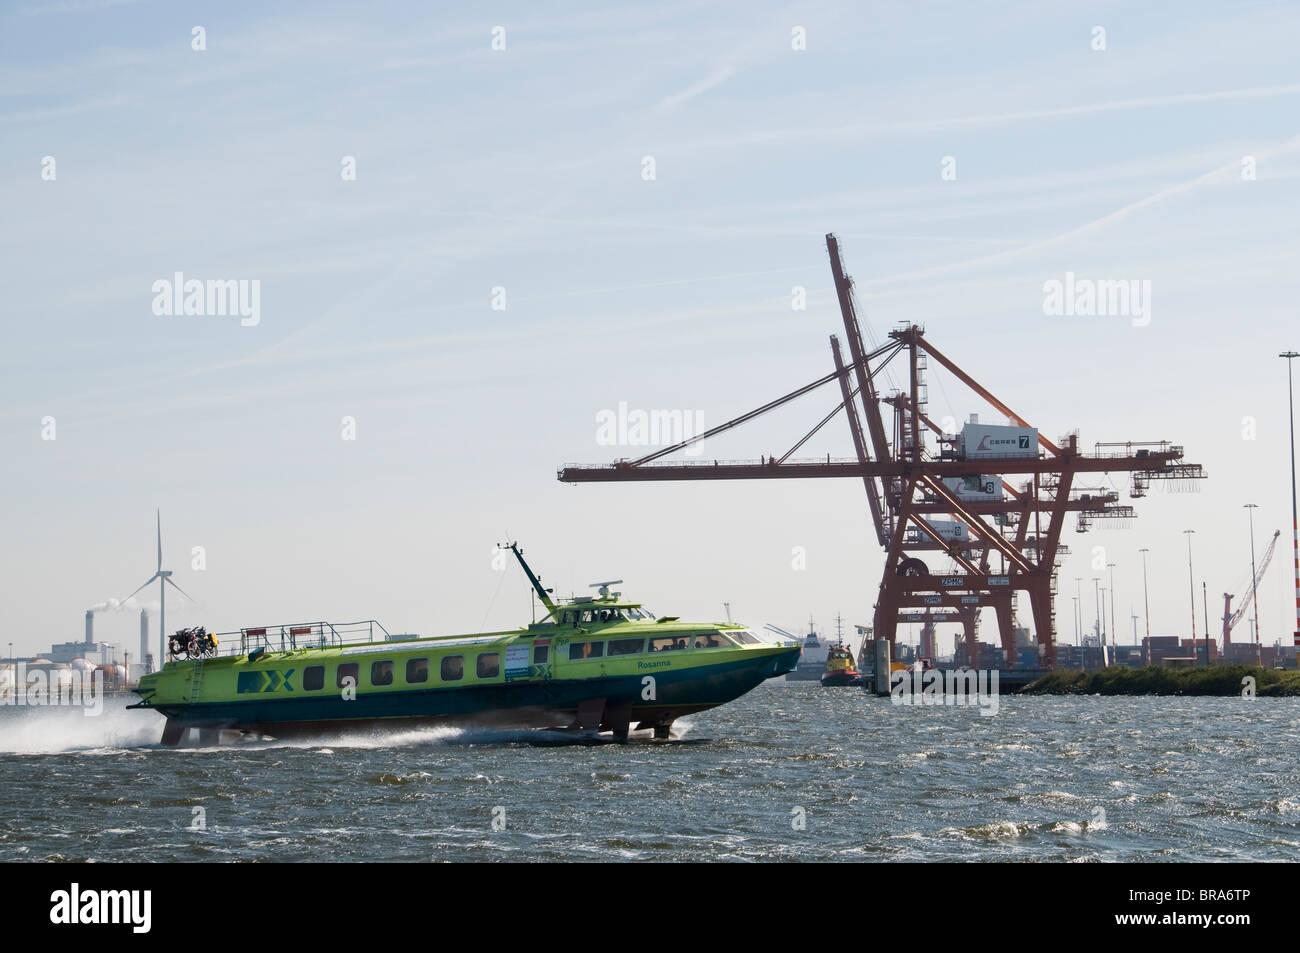 Paesi Bassi Amsterdam Il veloce aliscafi veloci traghetti battenti Noordzeekanaal Immagini Stock